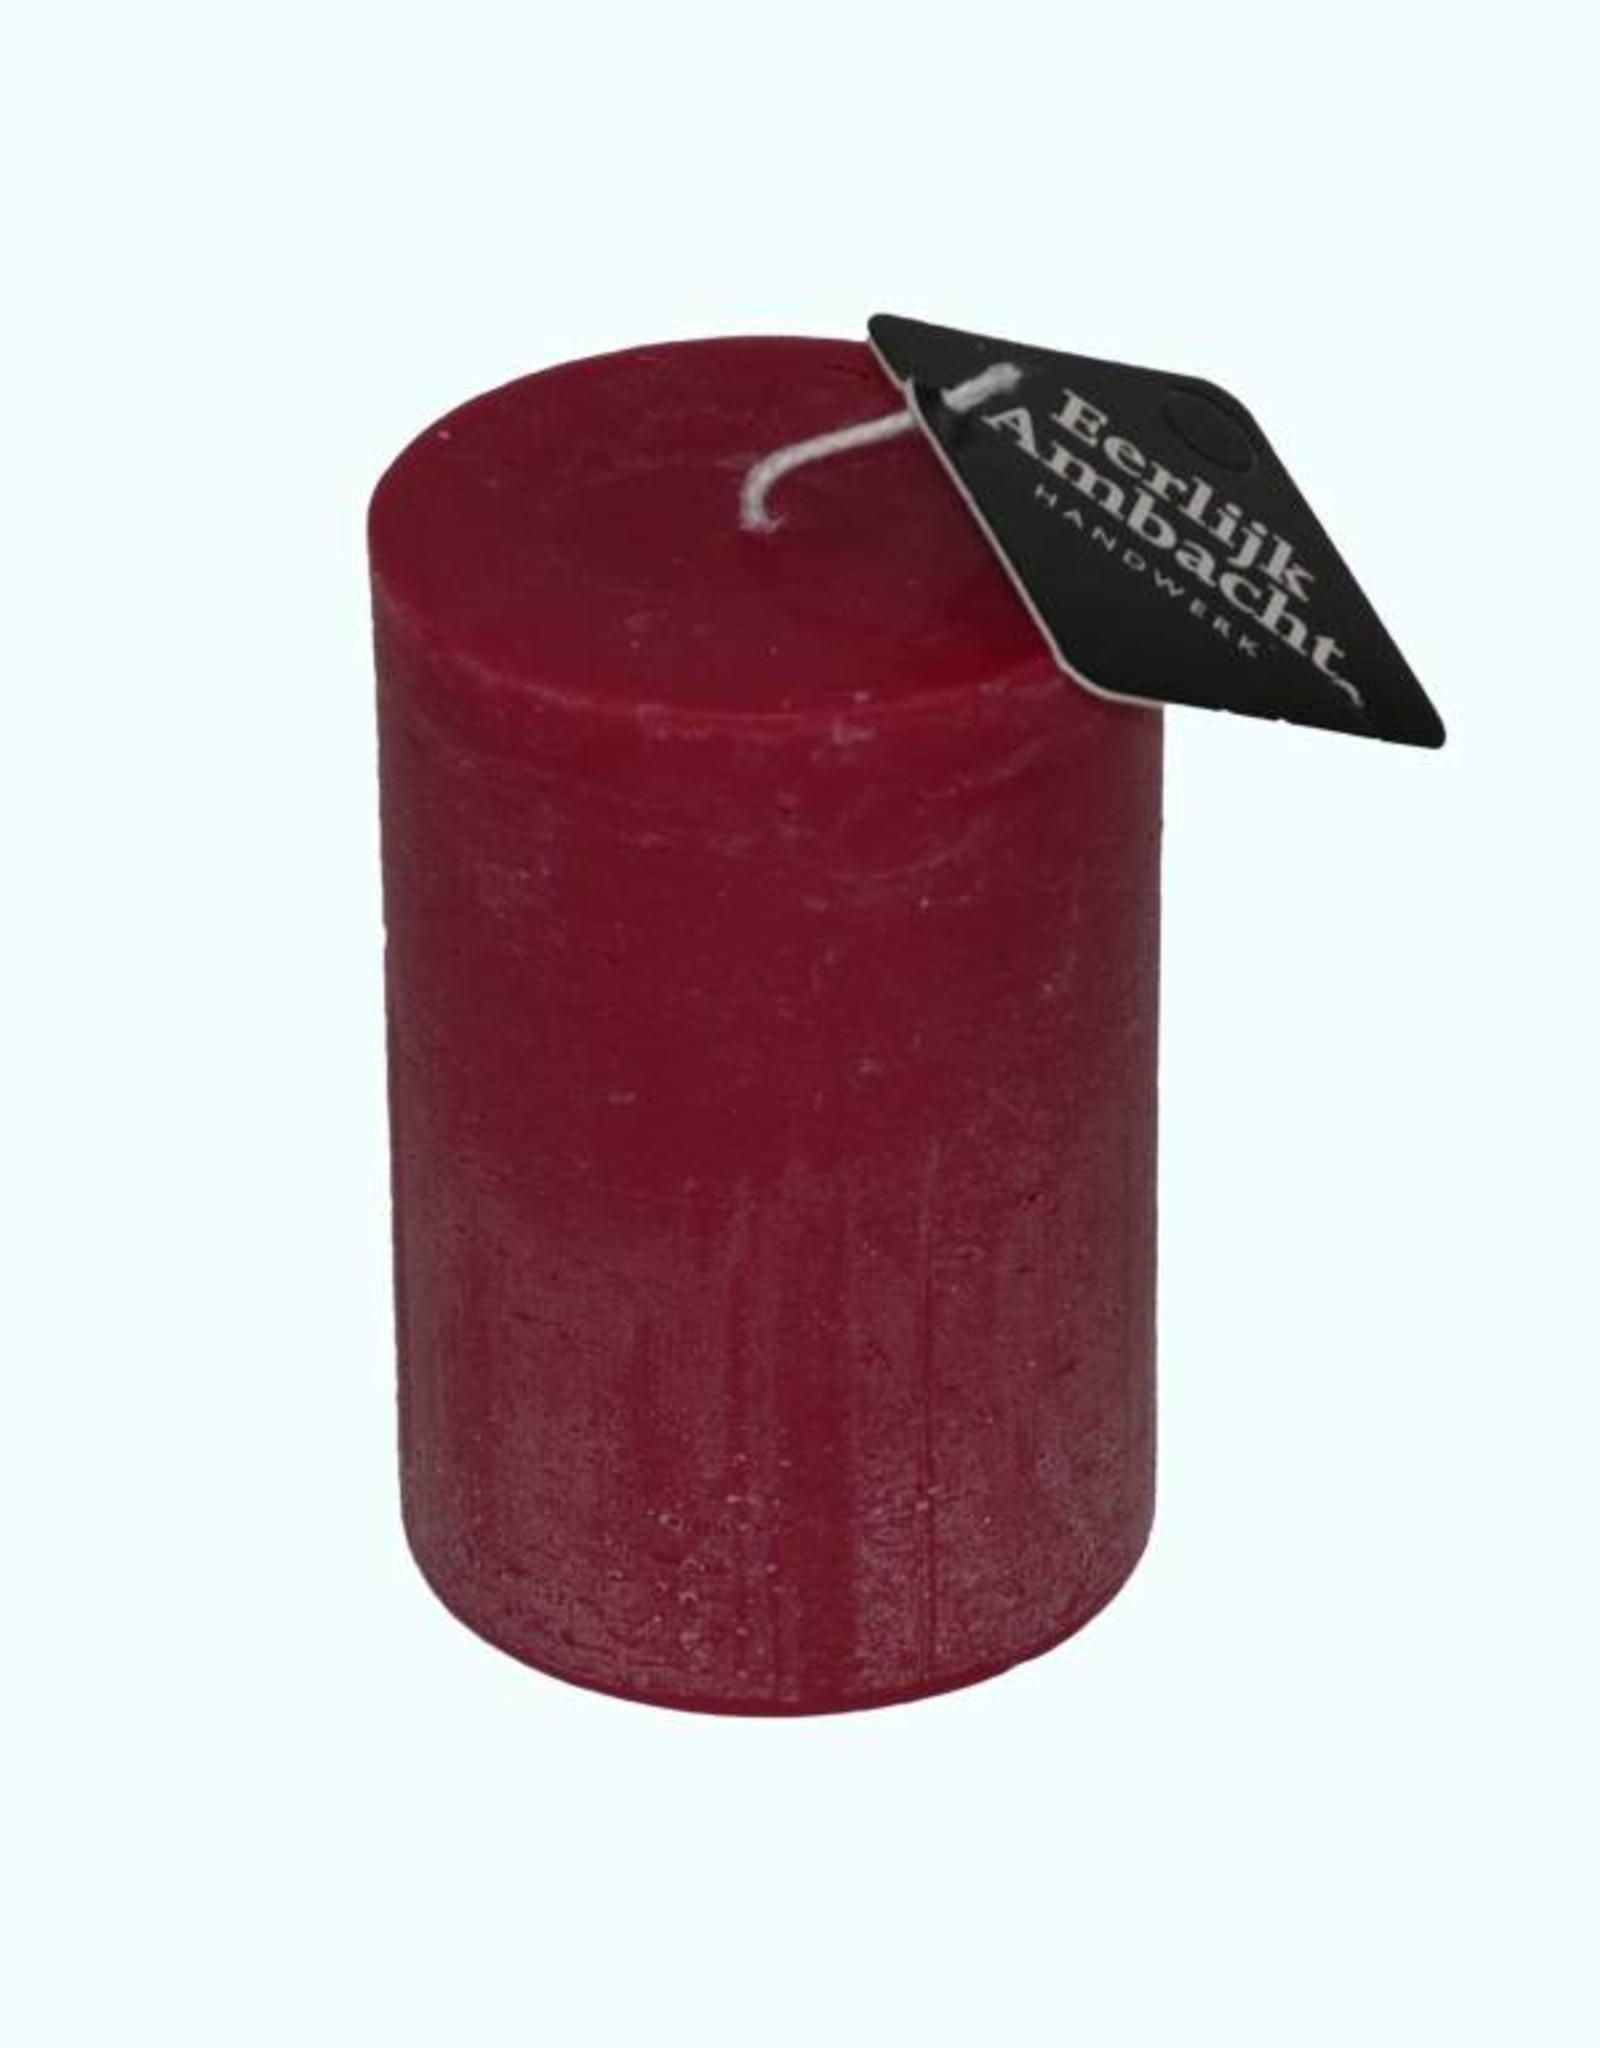 Rustieke Stompkaars Bordeaux Rood Ø 68x100 mm